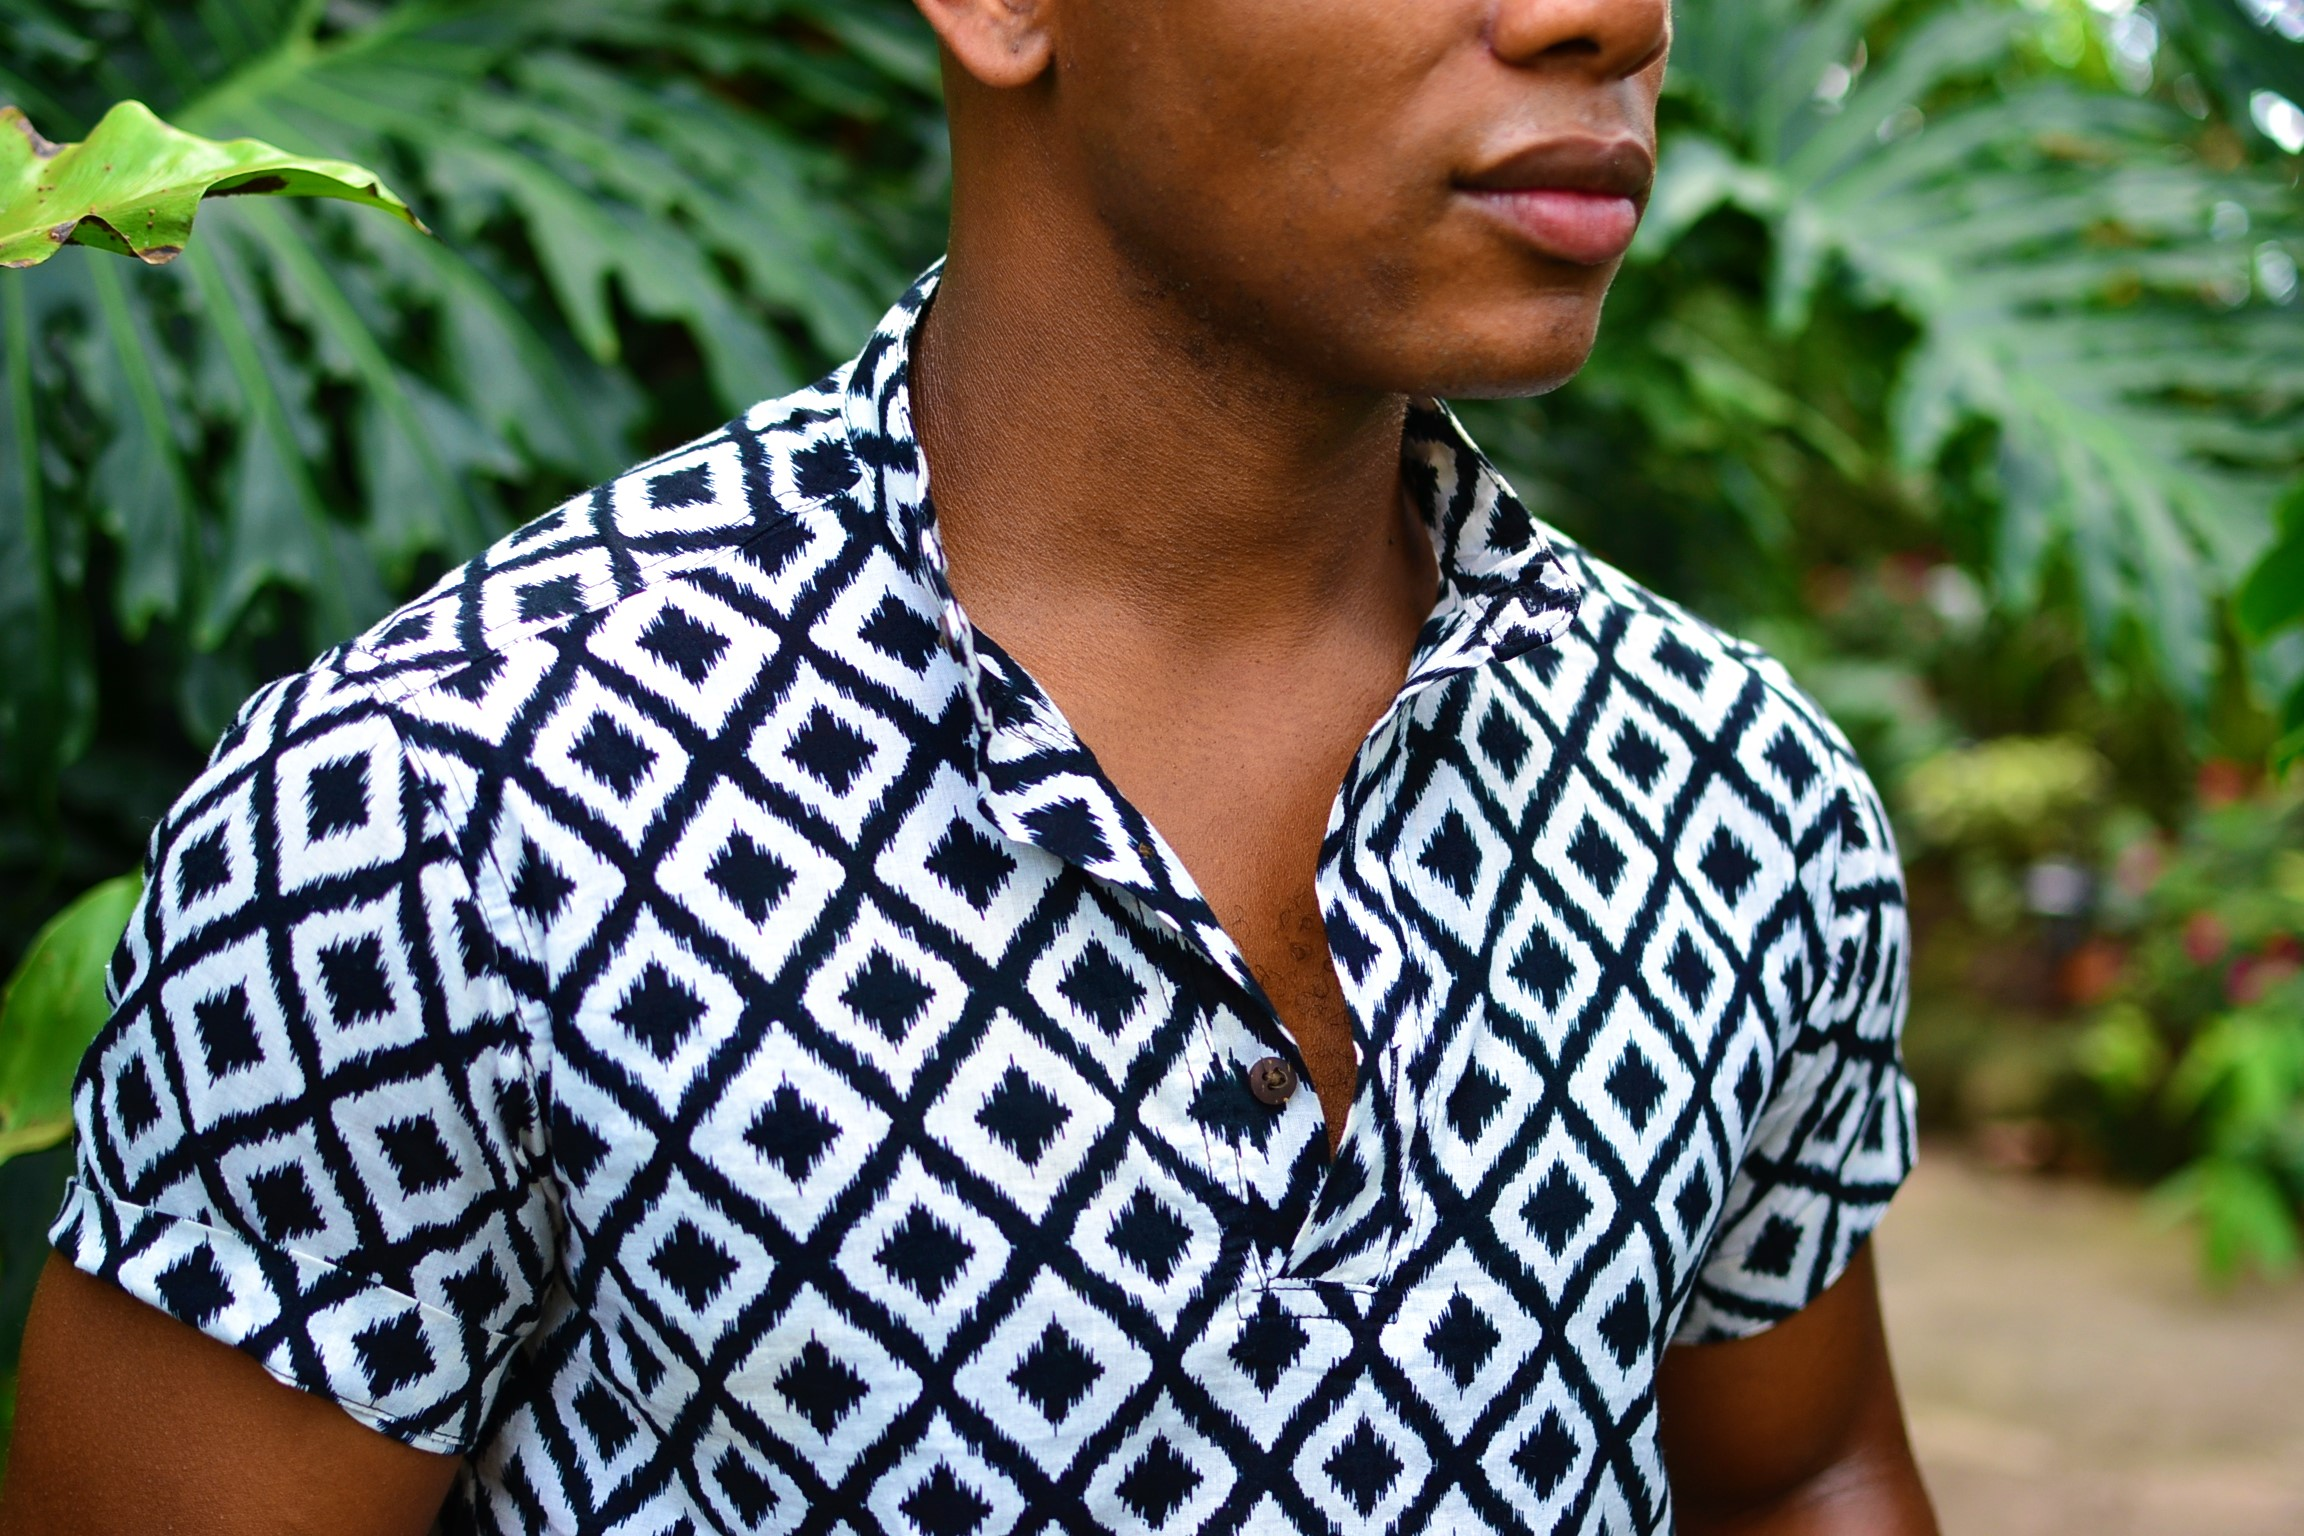 Sabir M. Peele in Hugh & Crye Band Collar Popover Shirt on Men's Style Pro